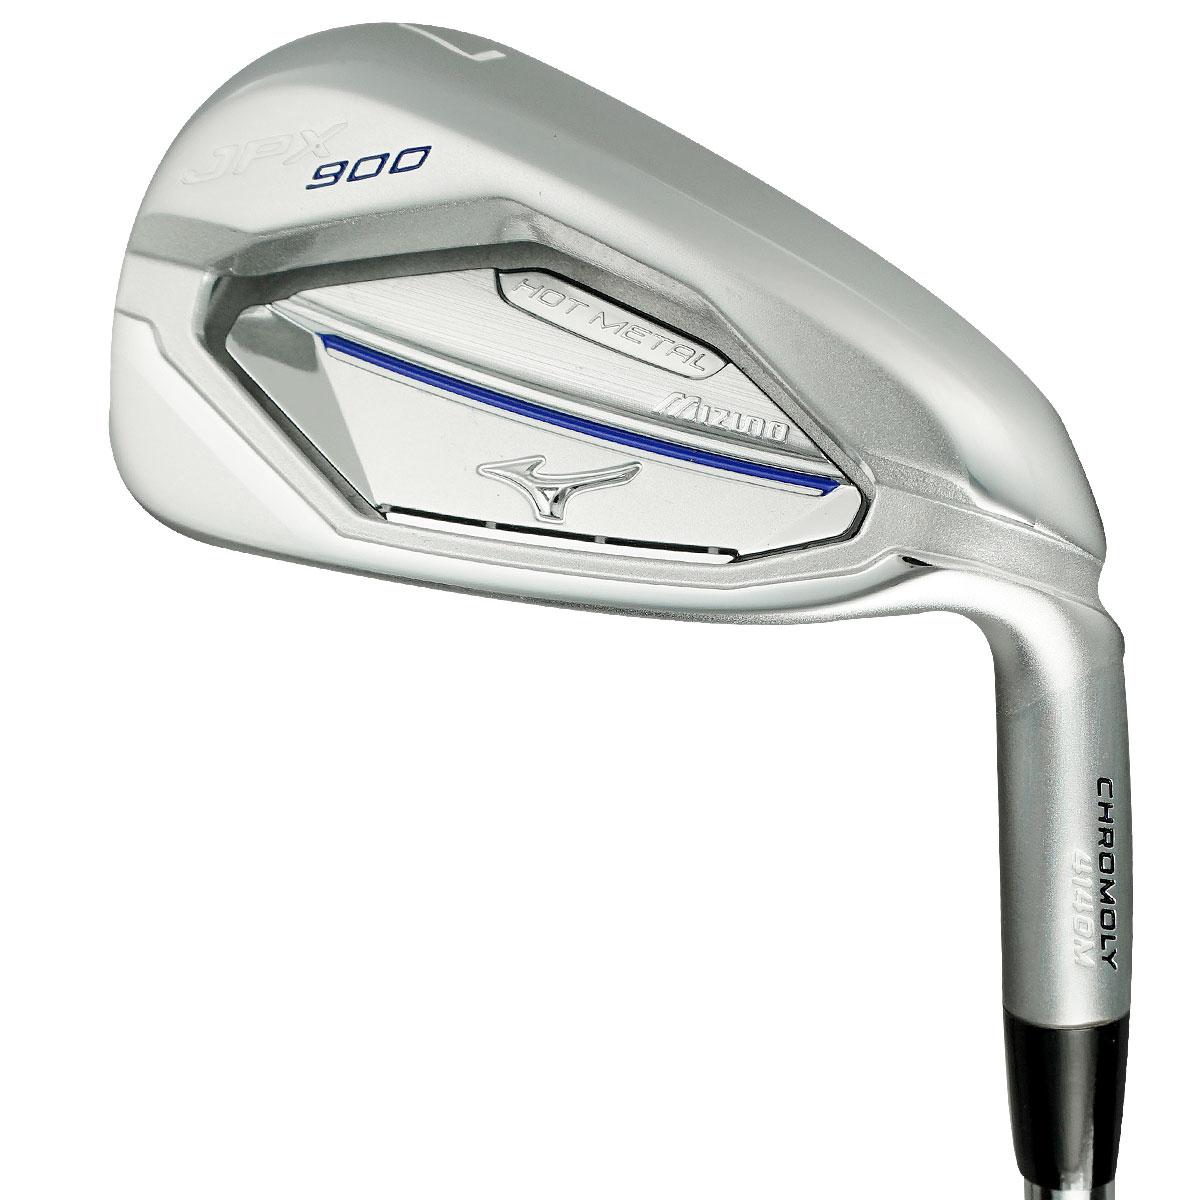 Mizuno Golf- JPX 900 Hot Metal Irons Stiff Flex 4-PW/GW